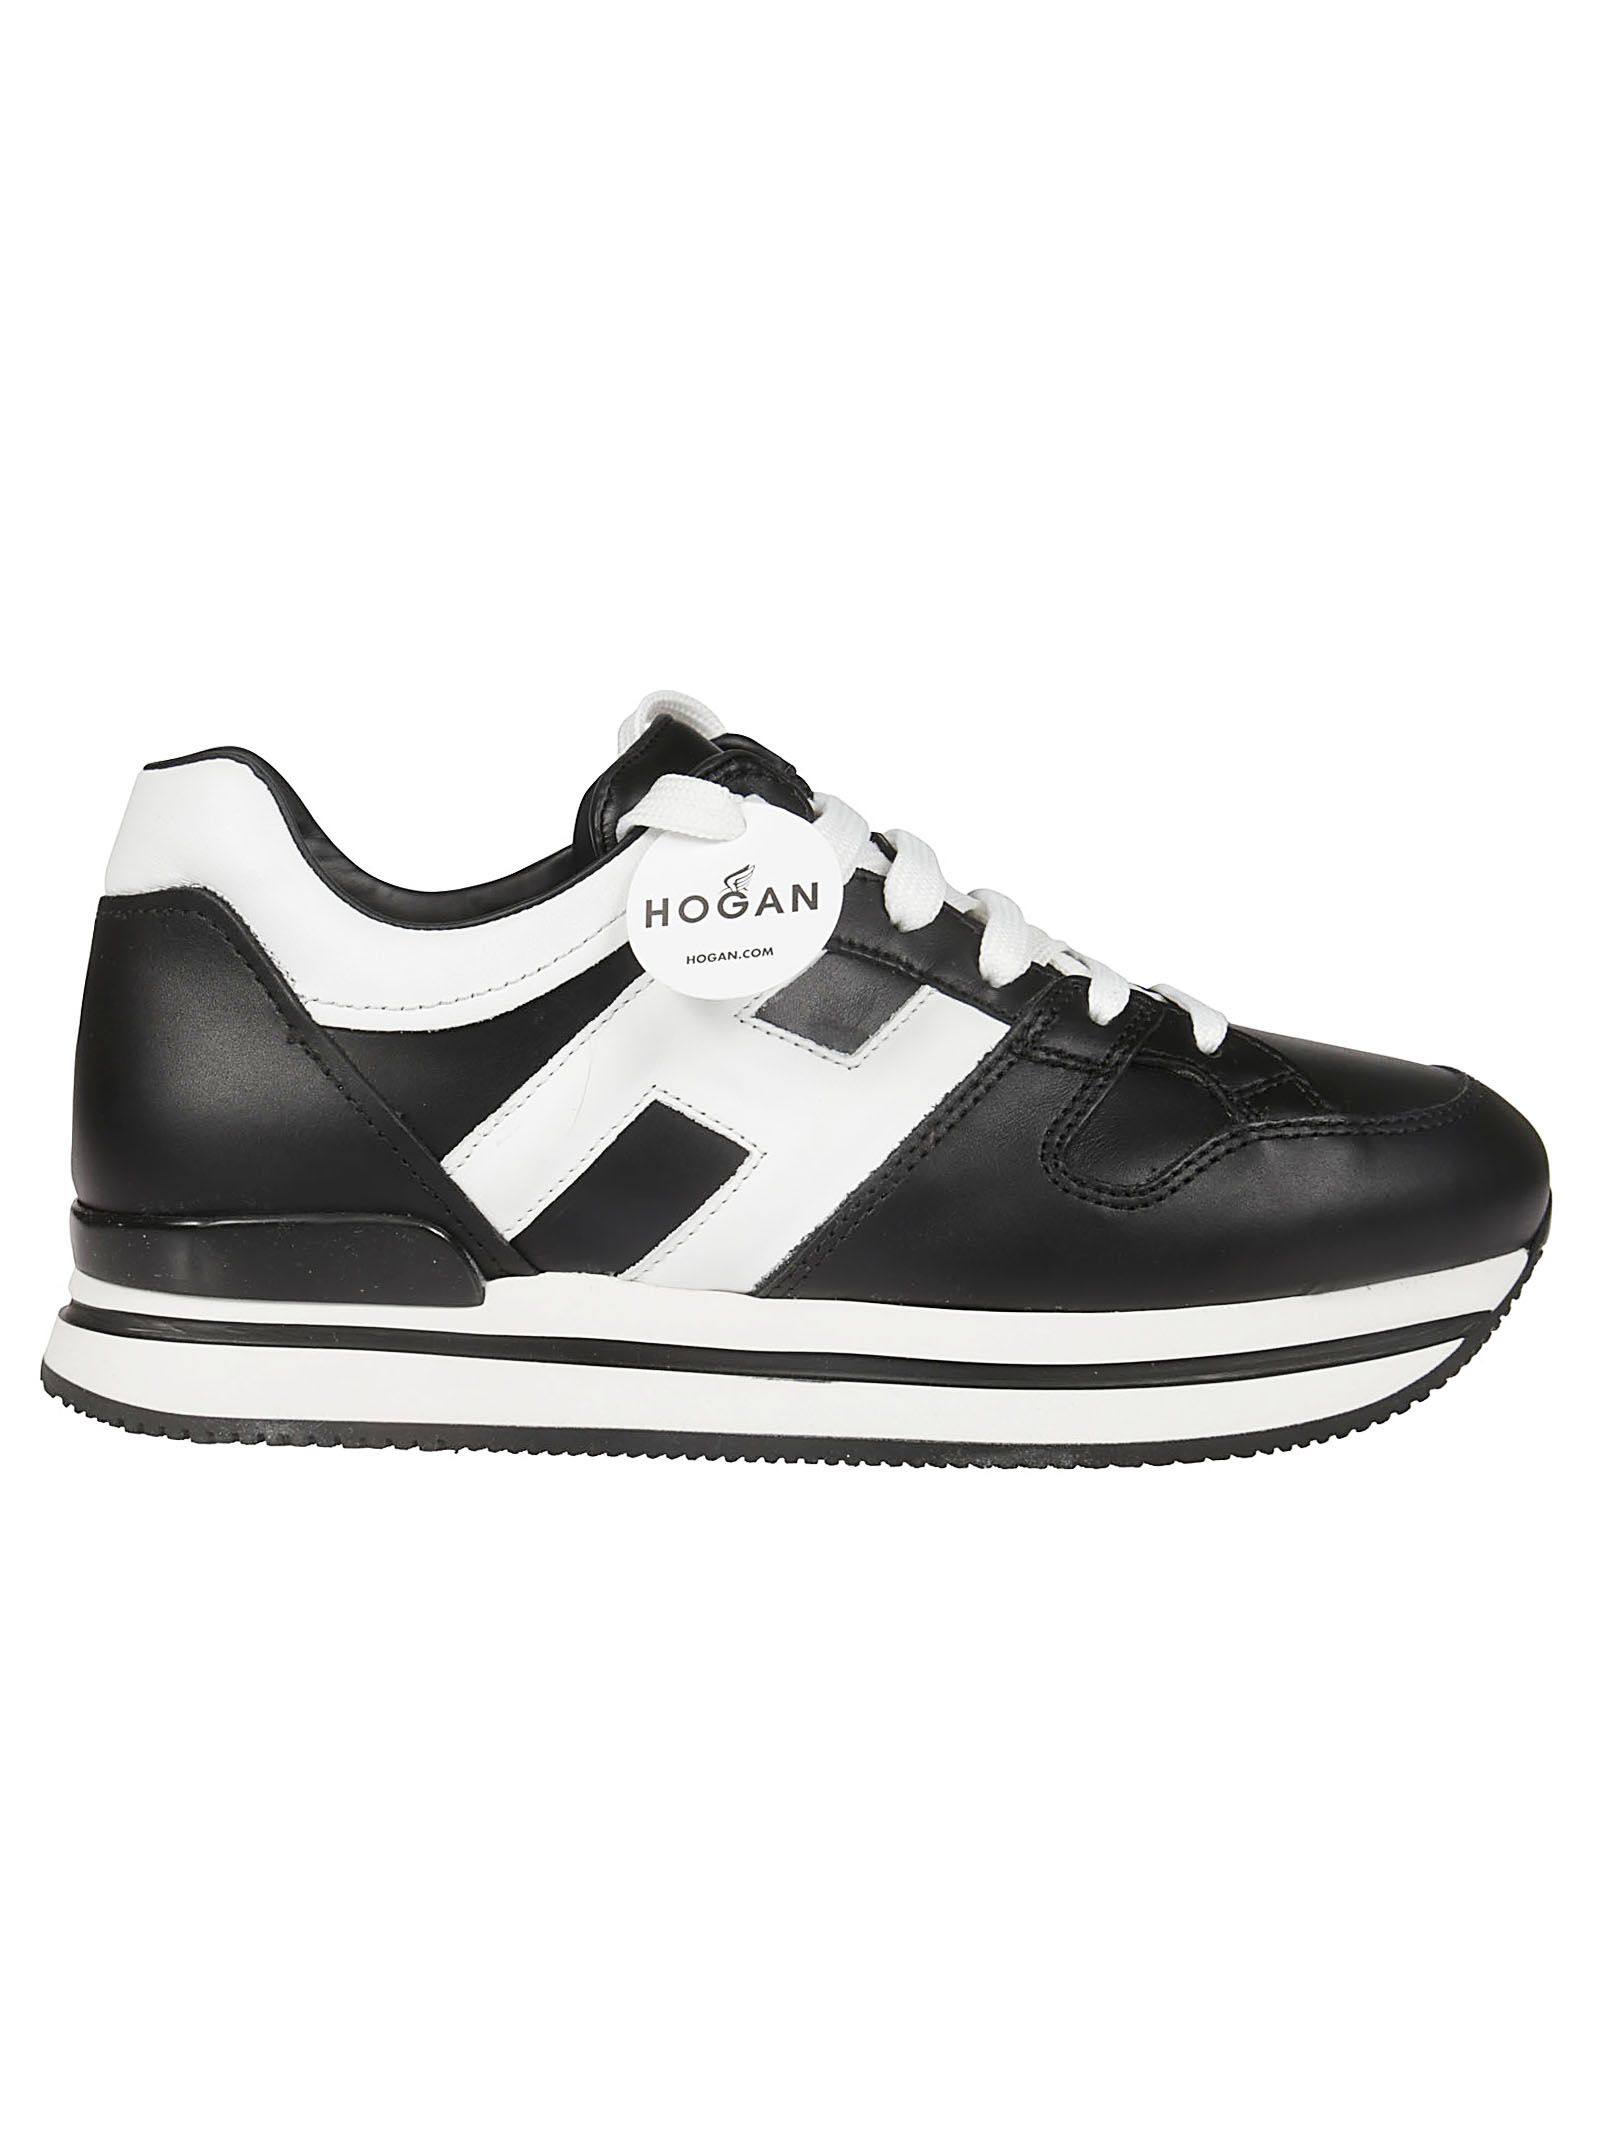 Hogan Paneled Platform Sneakers